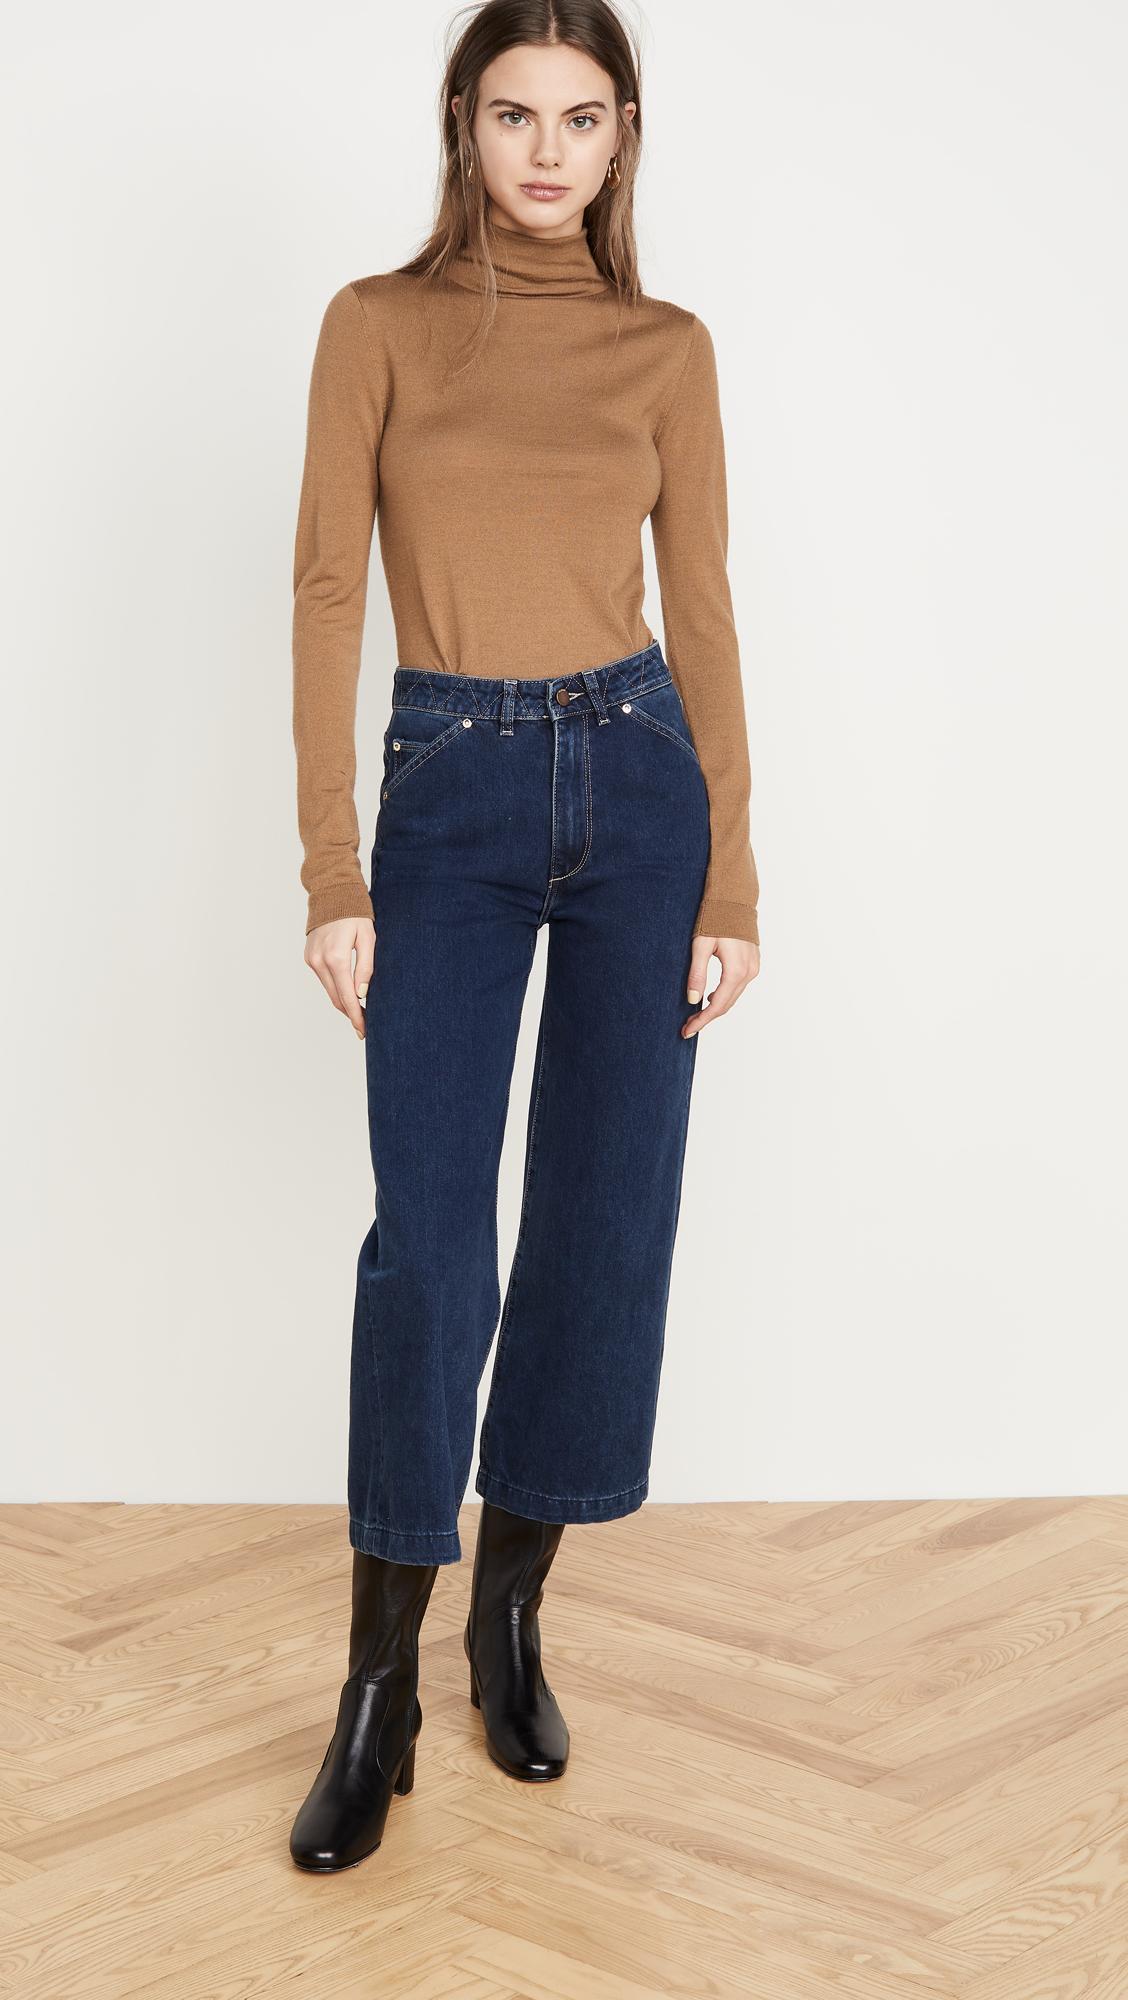 DL1961 Hepburn High Rise Wide Leg Jeans